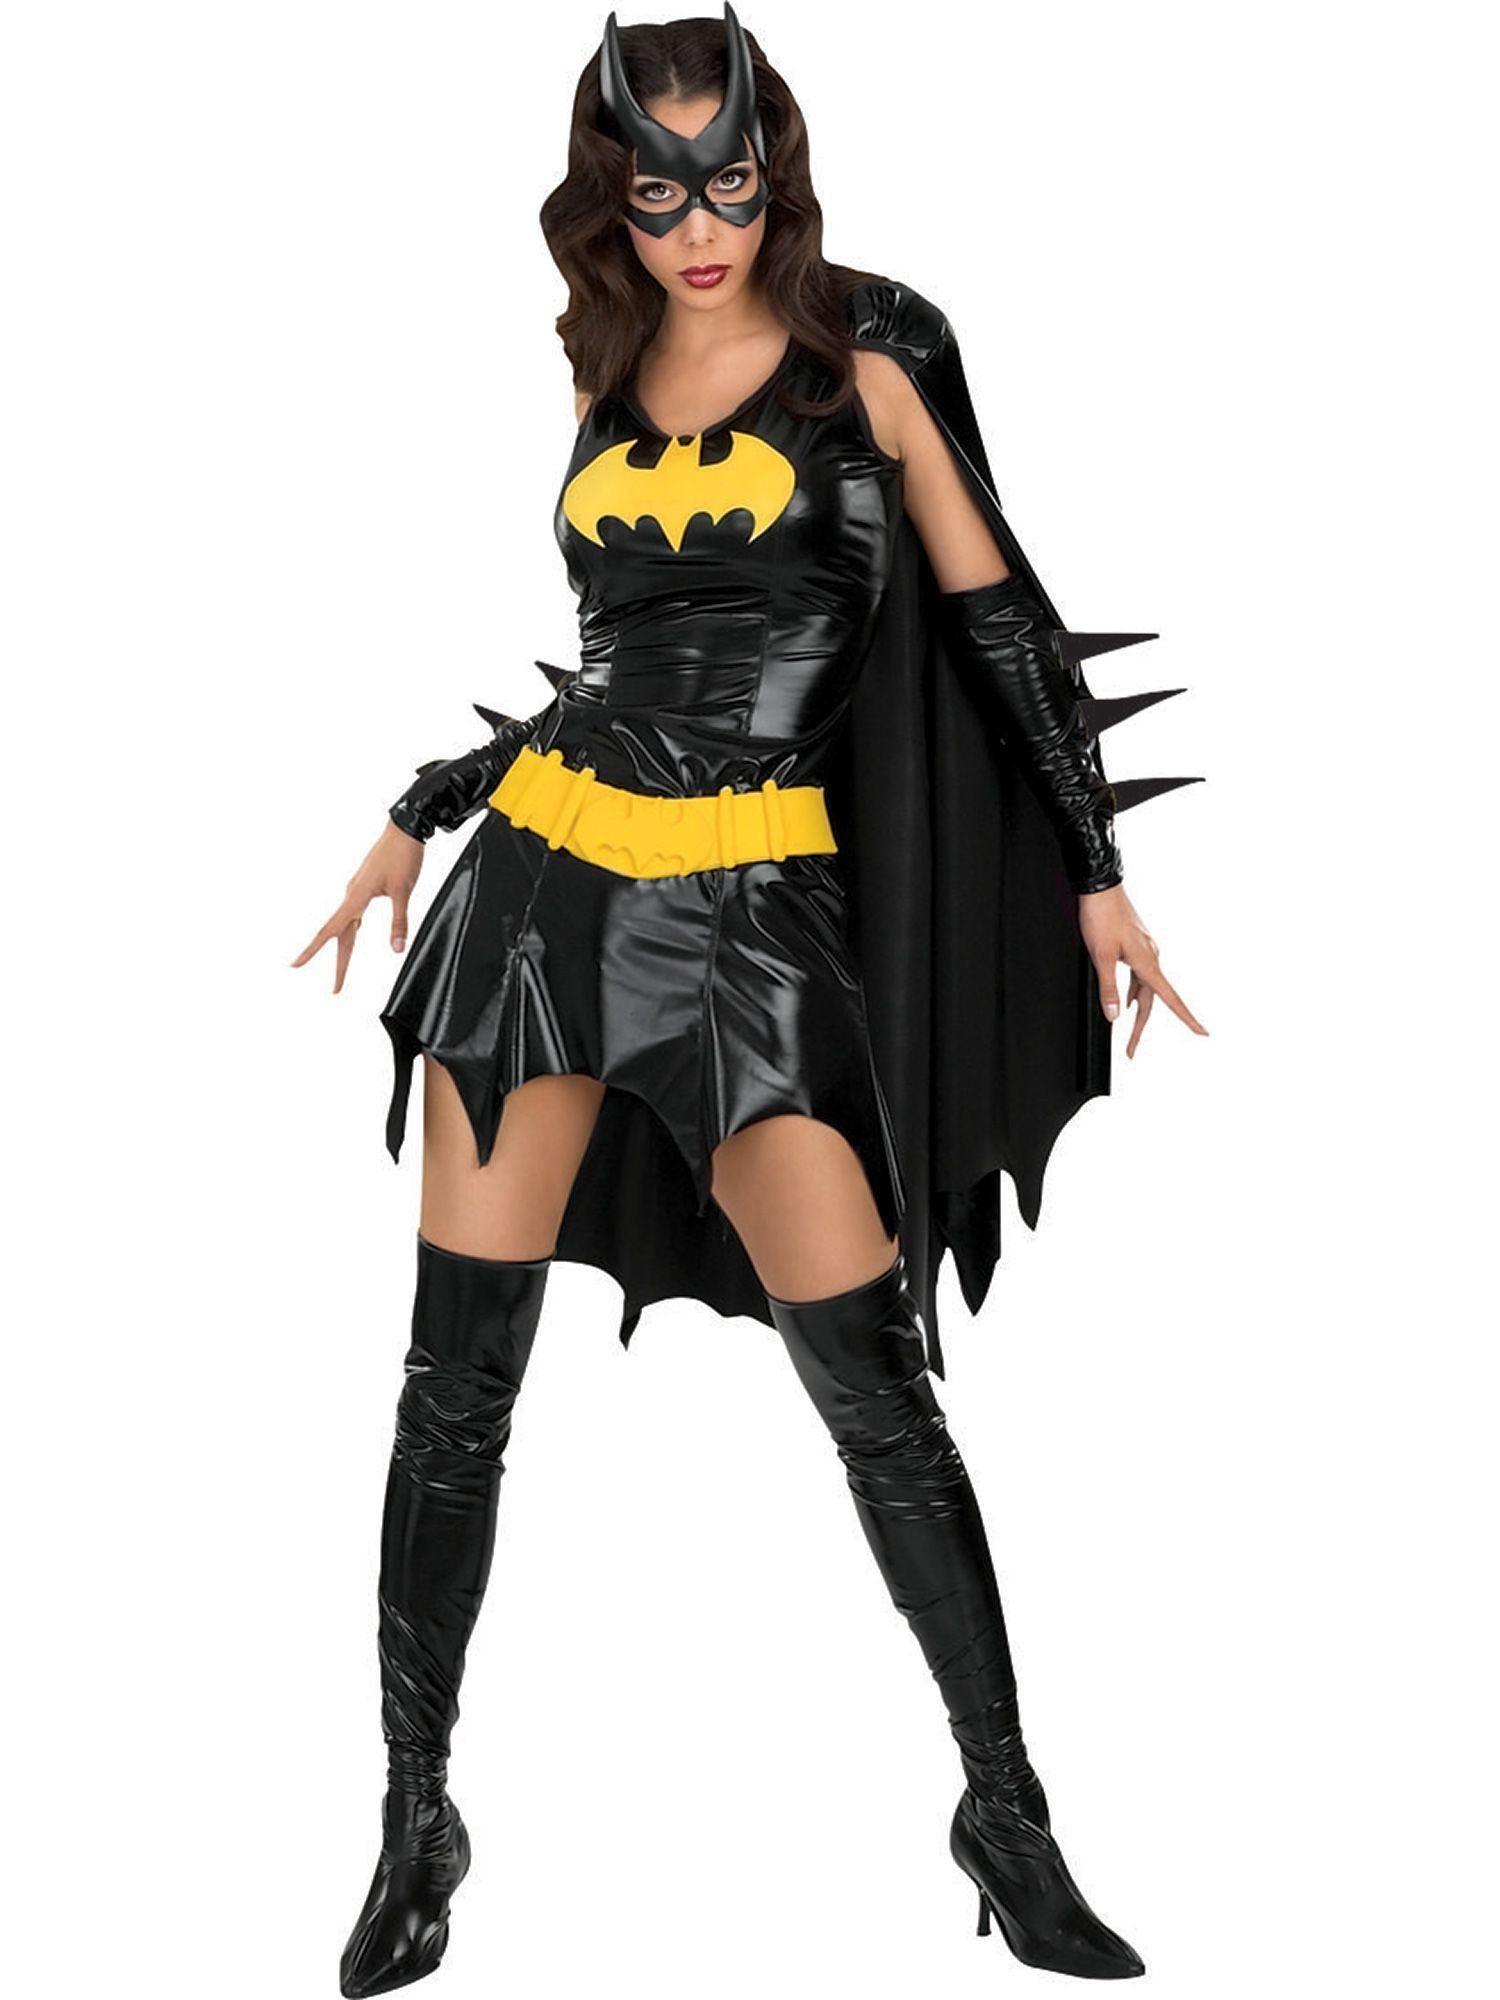 Fantasia Adulto Feminino: Batgirl (Apenas Venda Online)